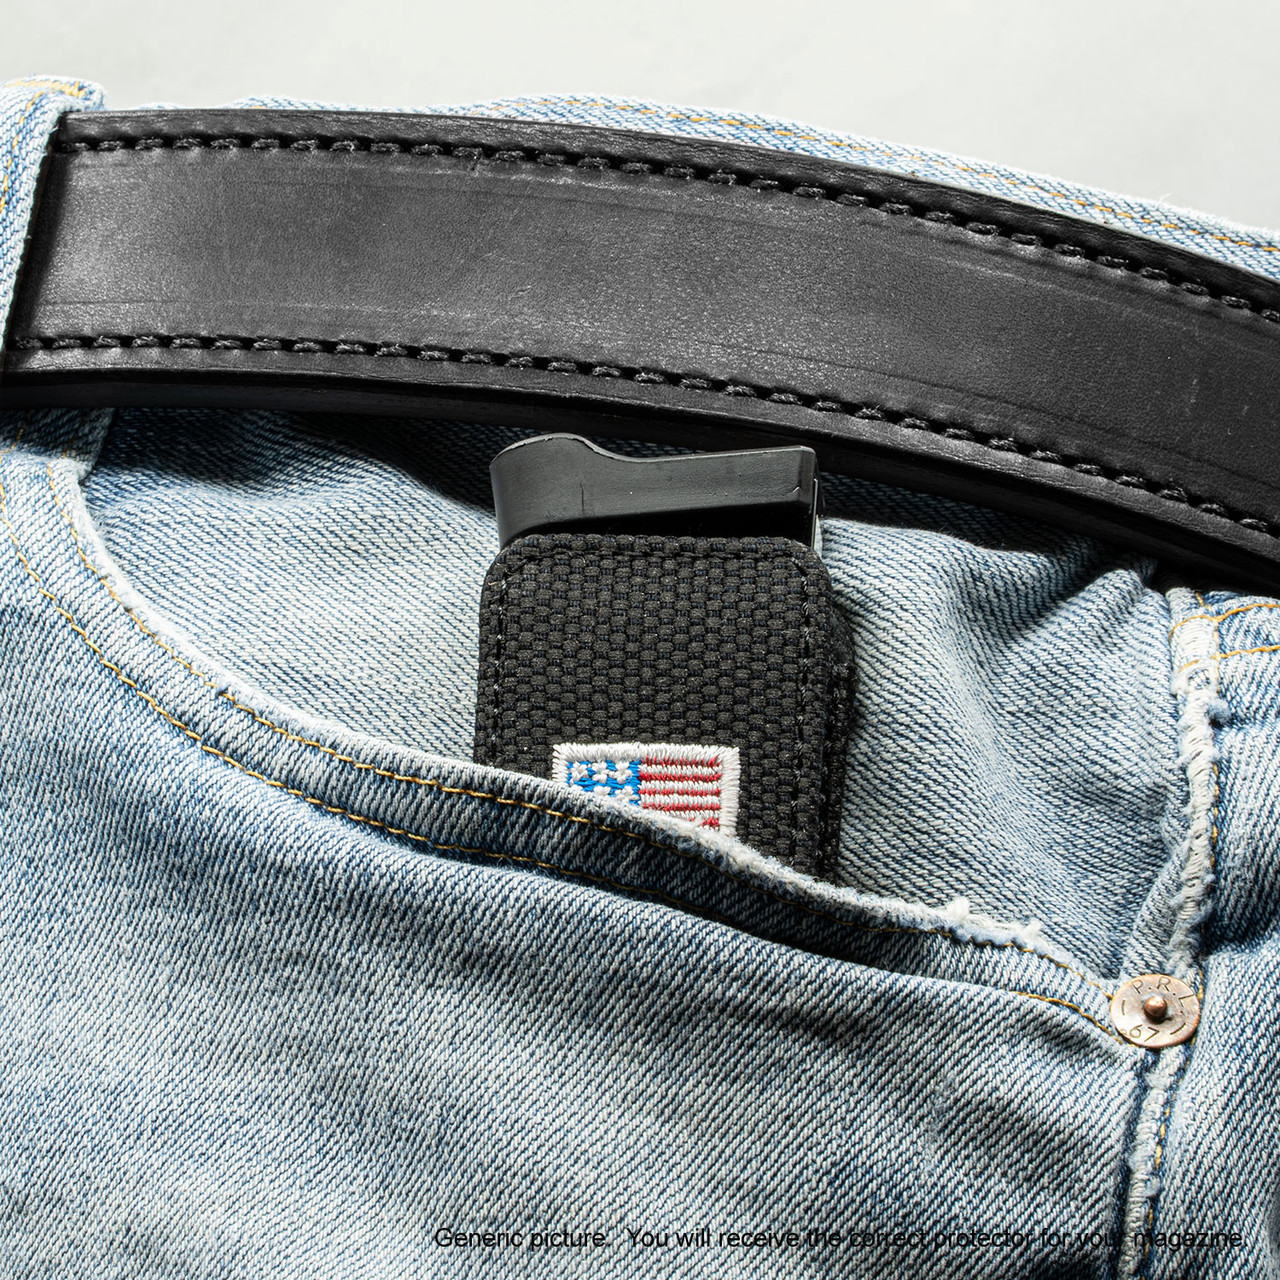 Walther PPK Black Canvas Flag Magazine Pocket Protector